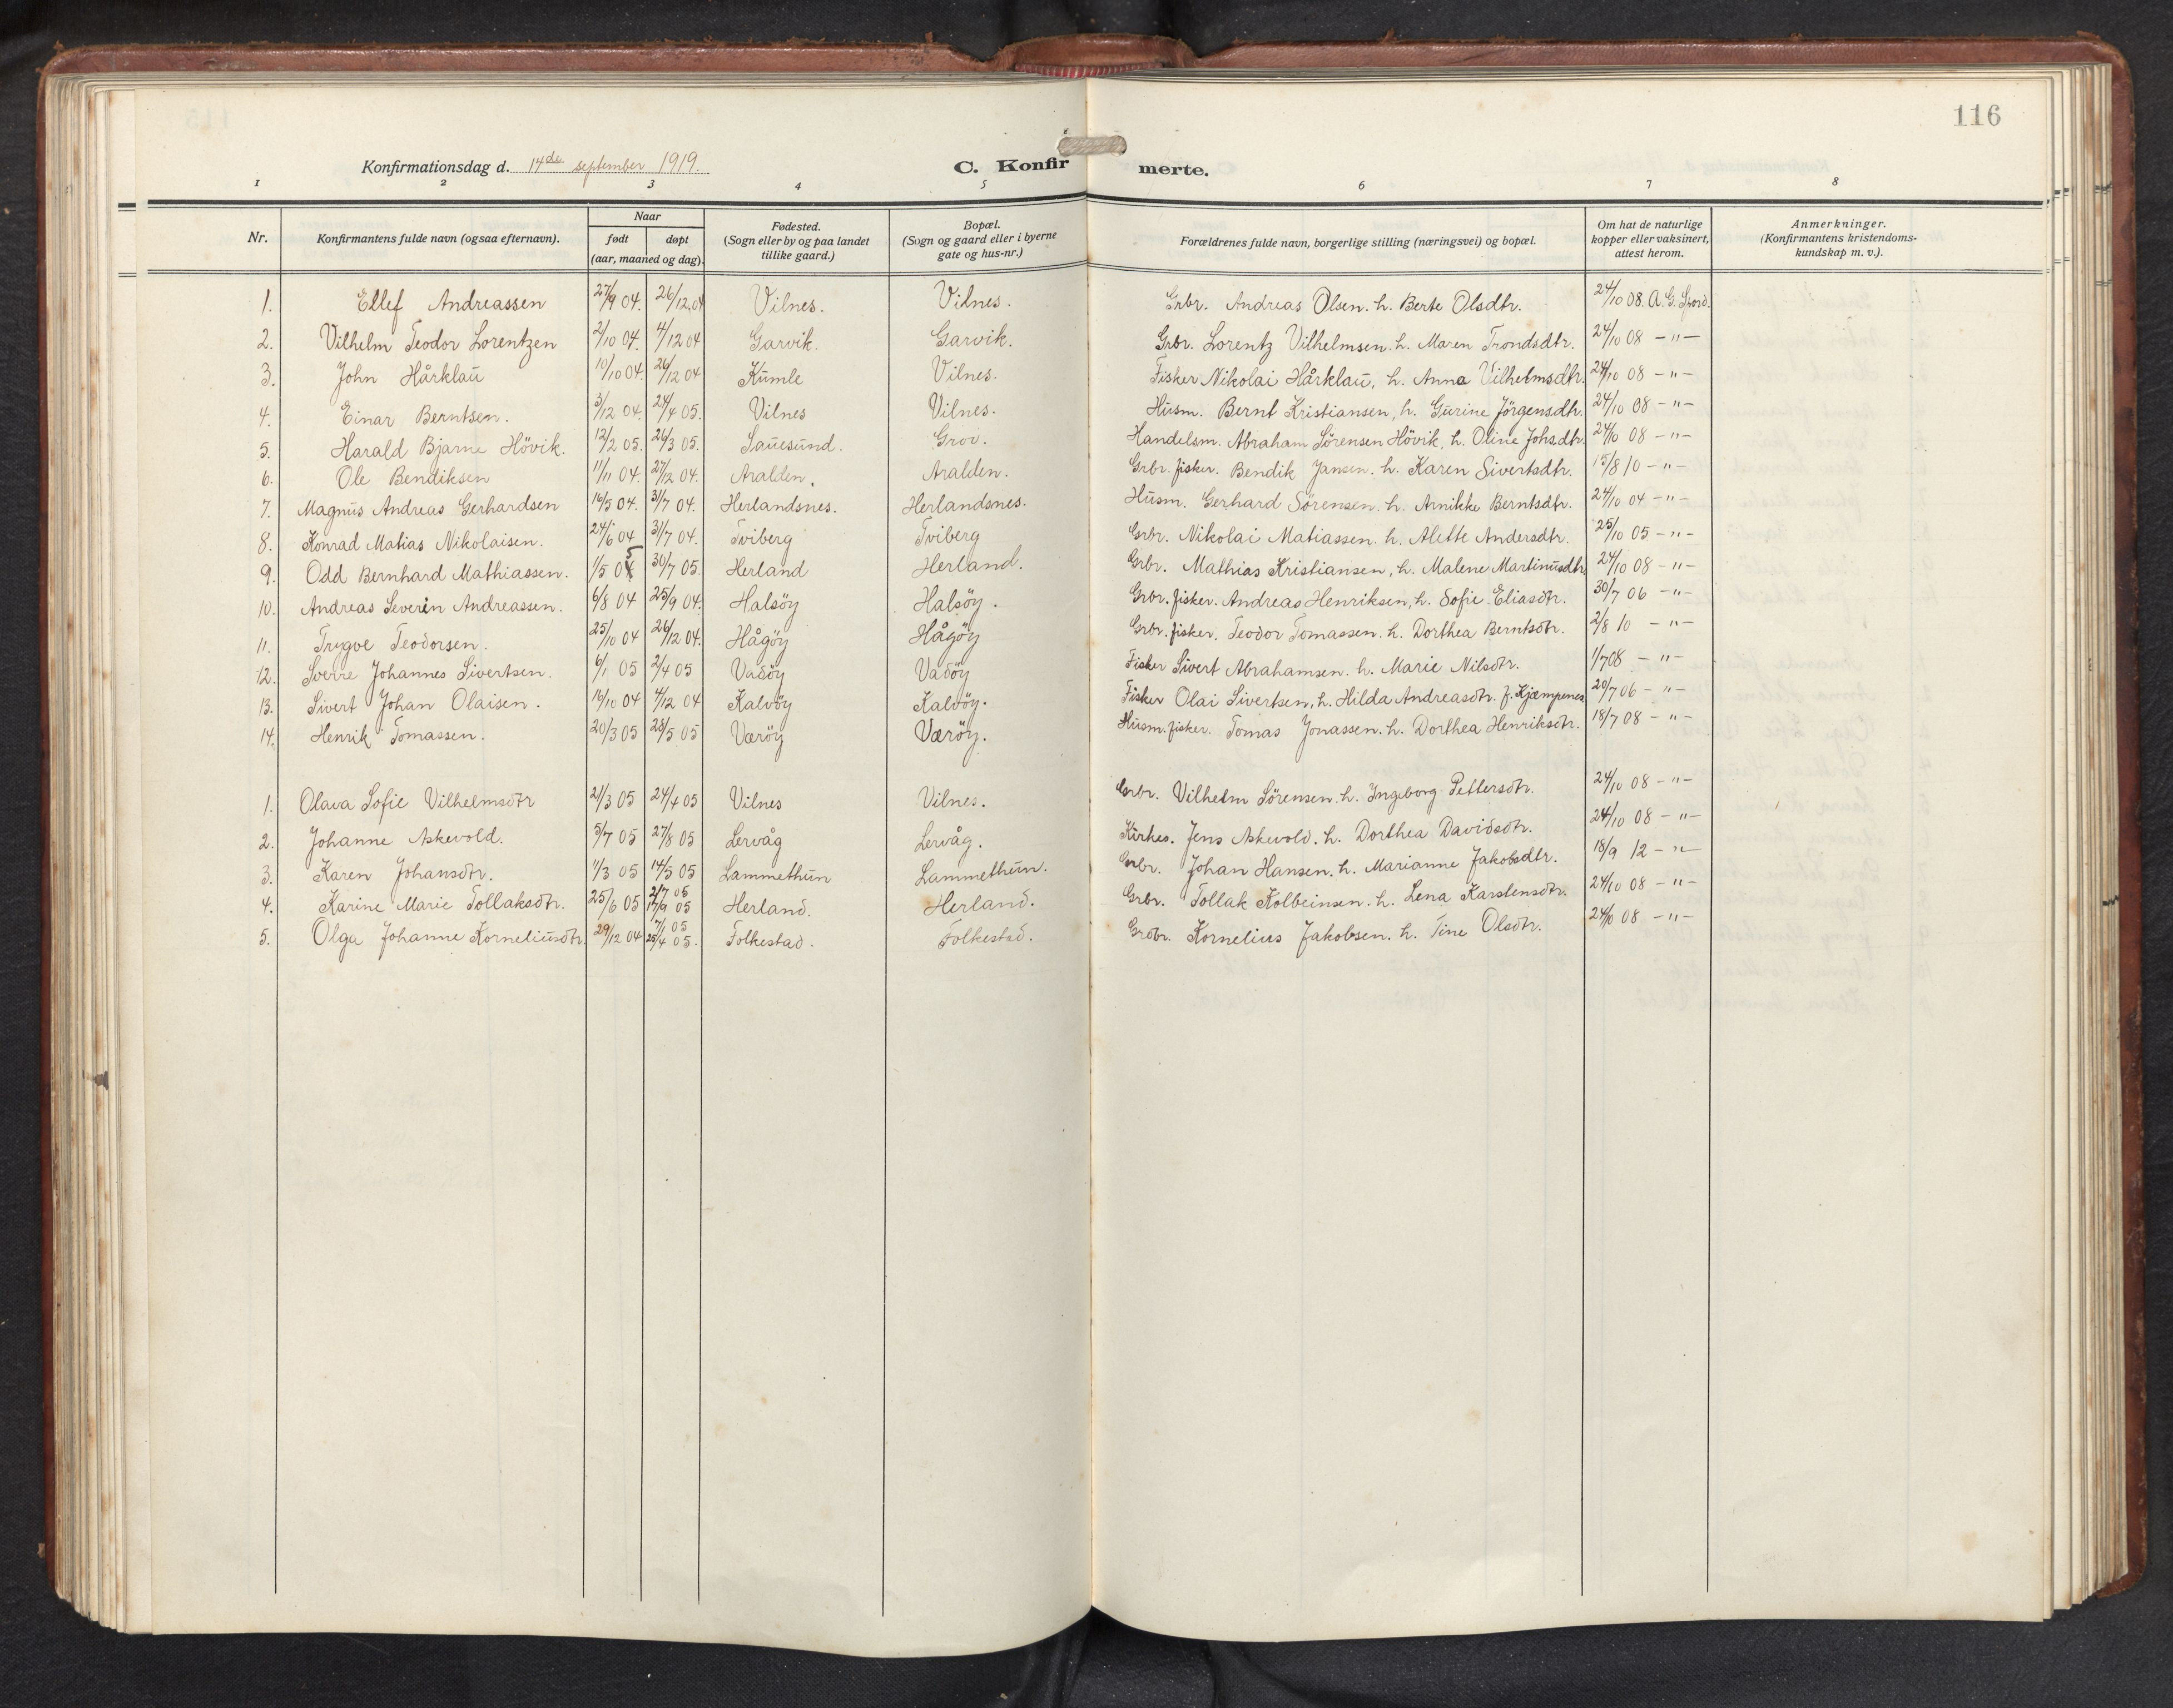 SAB, Askvoll sokneprestembete, H/Hab/Habb/L0002: Klokkerbok nr. B 2, 1910-1947, s. 115b-116a